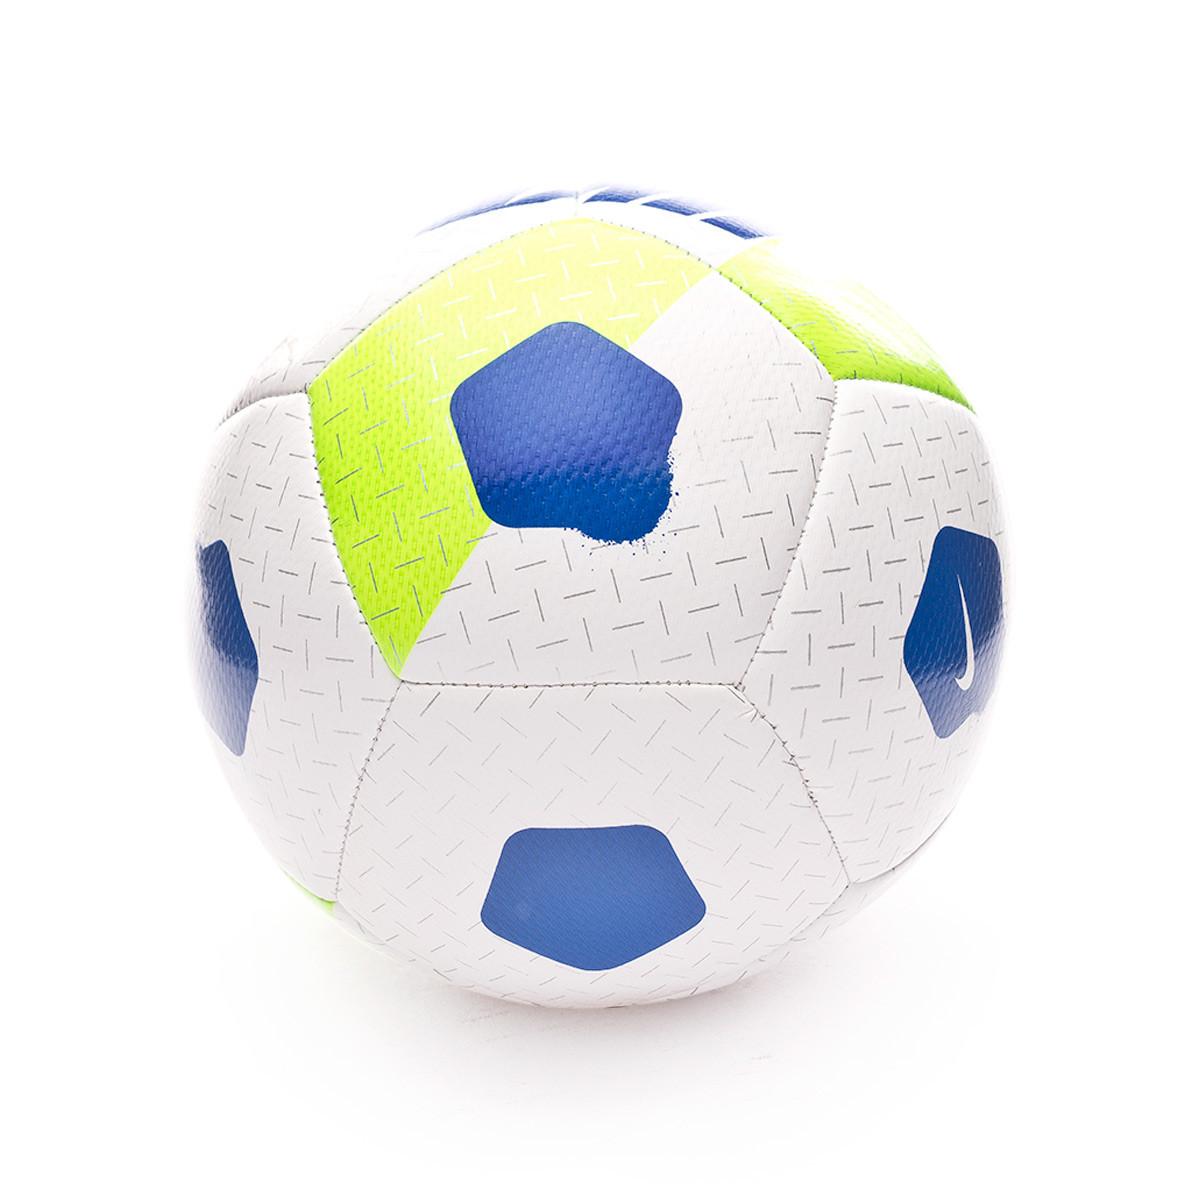 Ballon Nike Futsal Street Akka 2019 2020